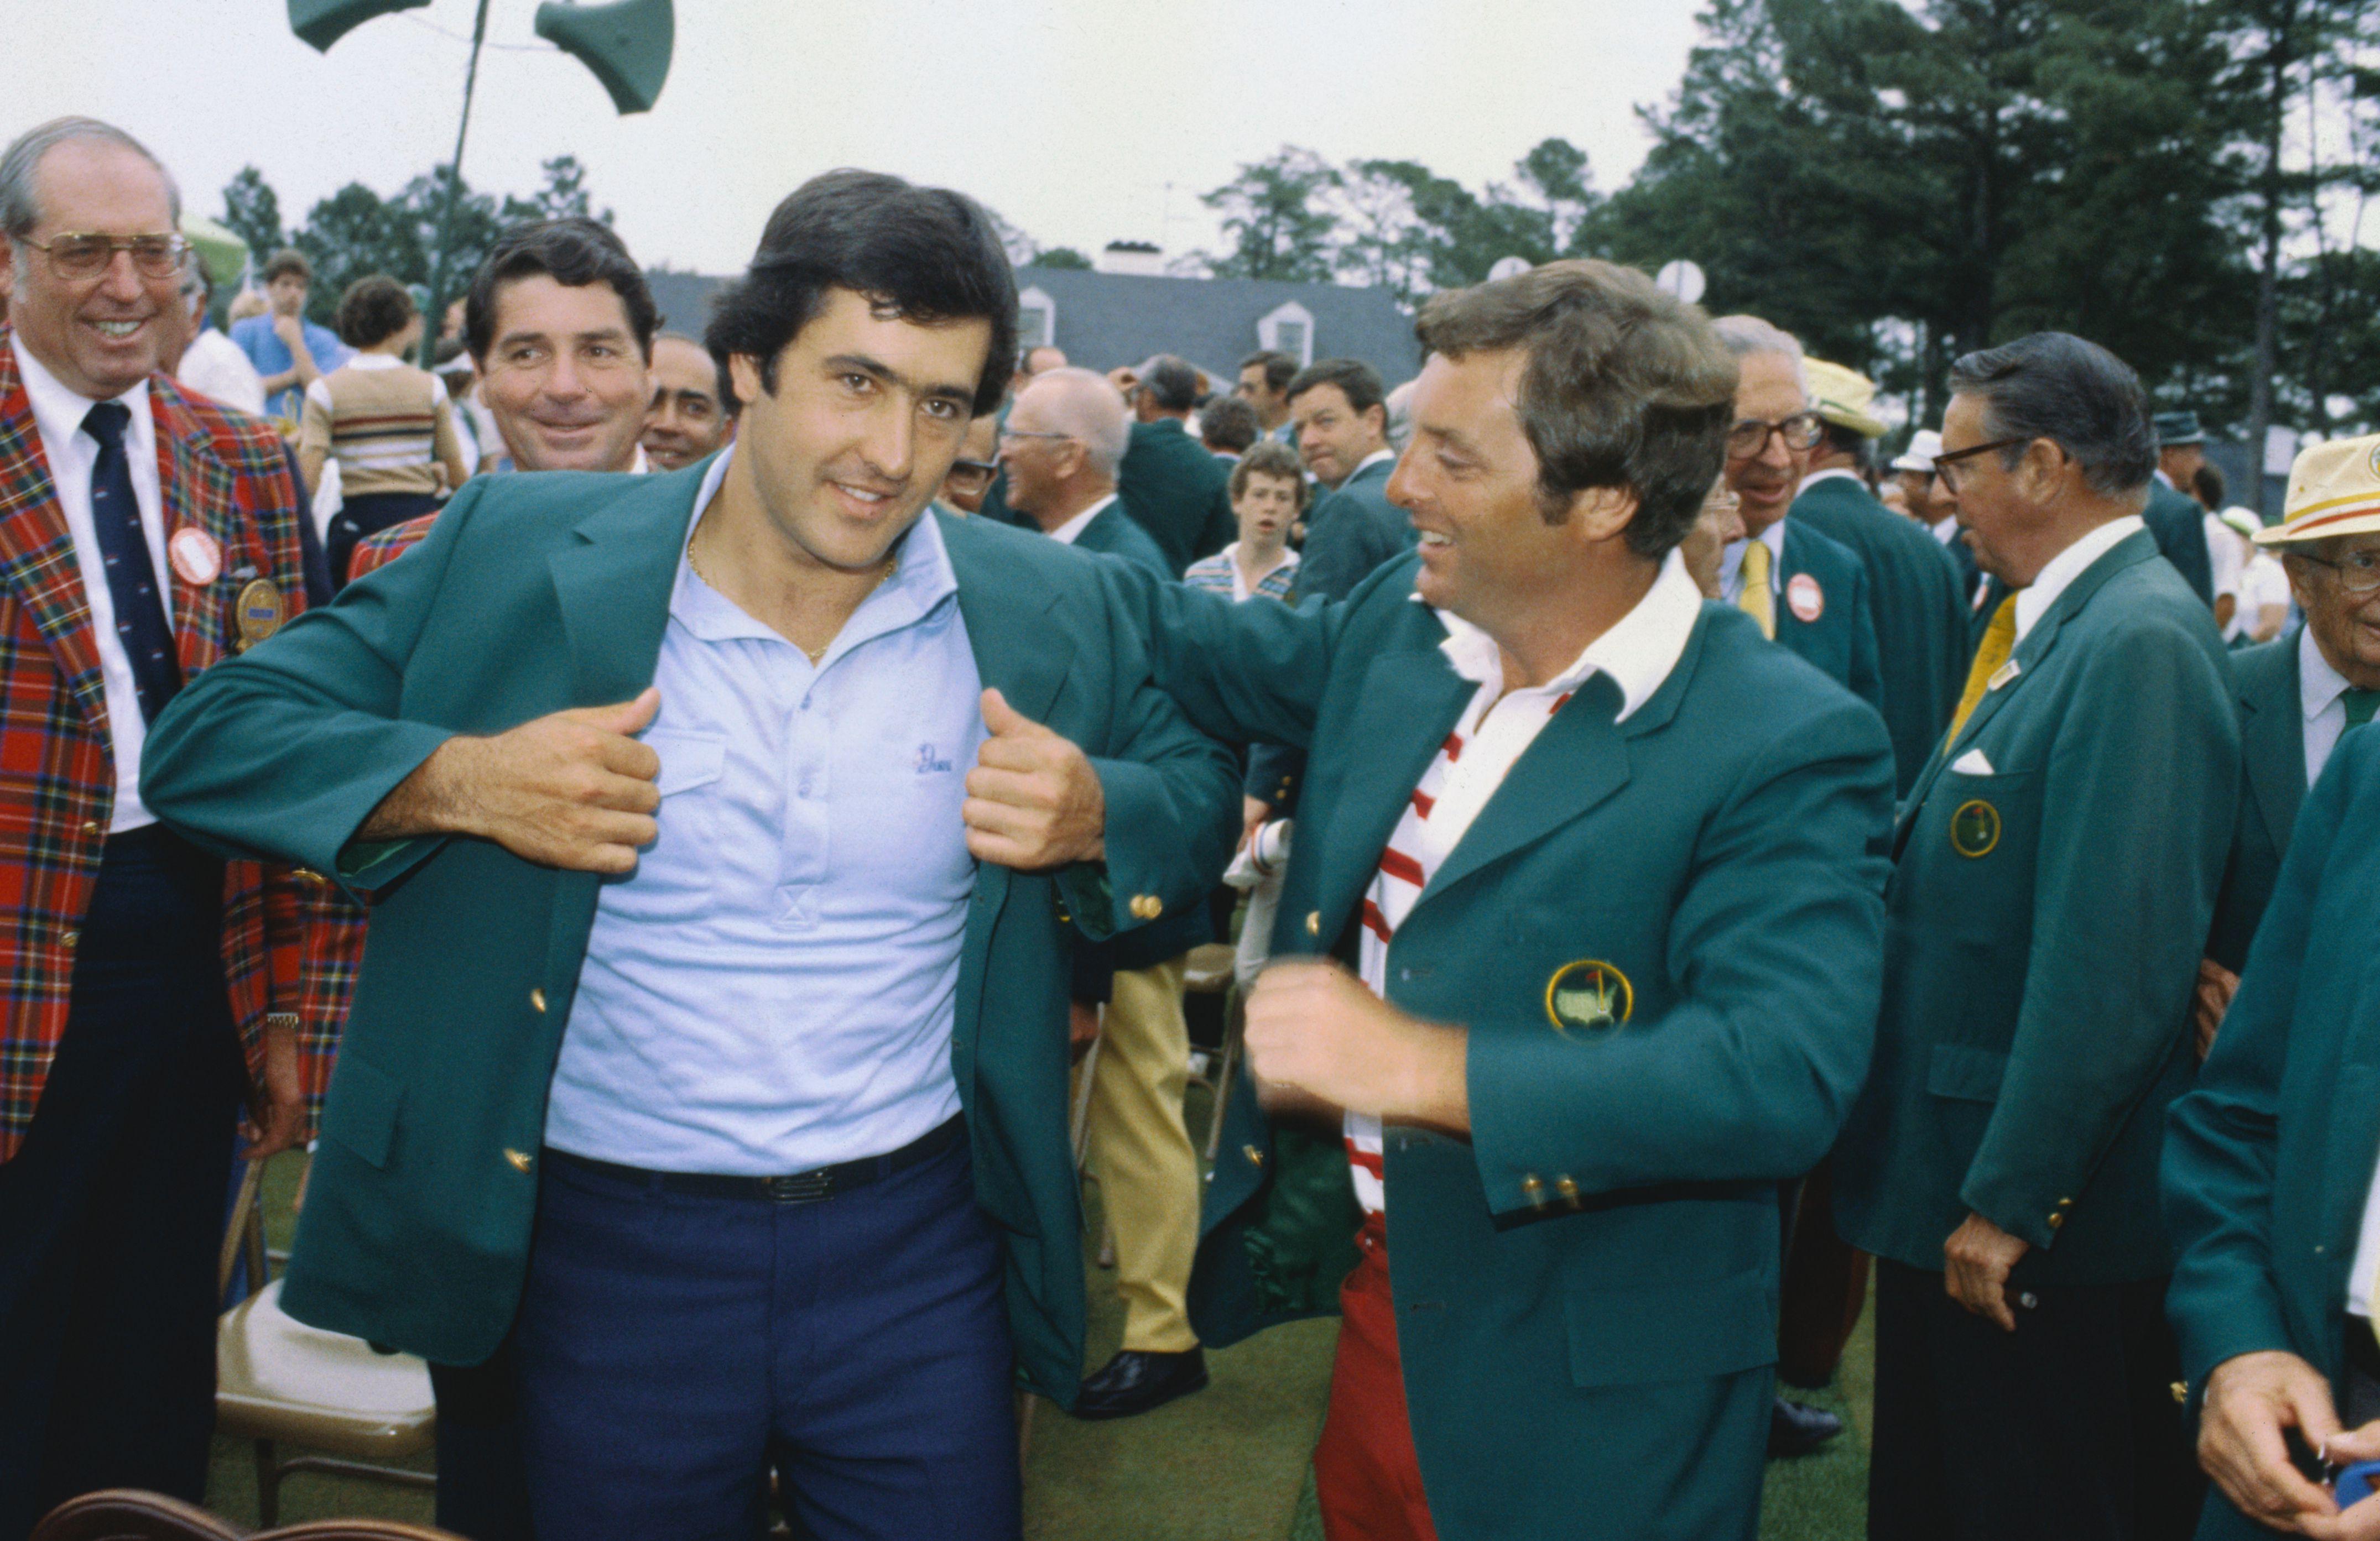 Seve Ballesteros Spanish professional golfer, winner of 1980 Masters tournament, wearing green coat.